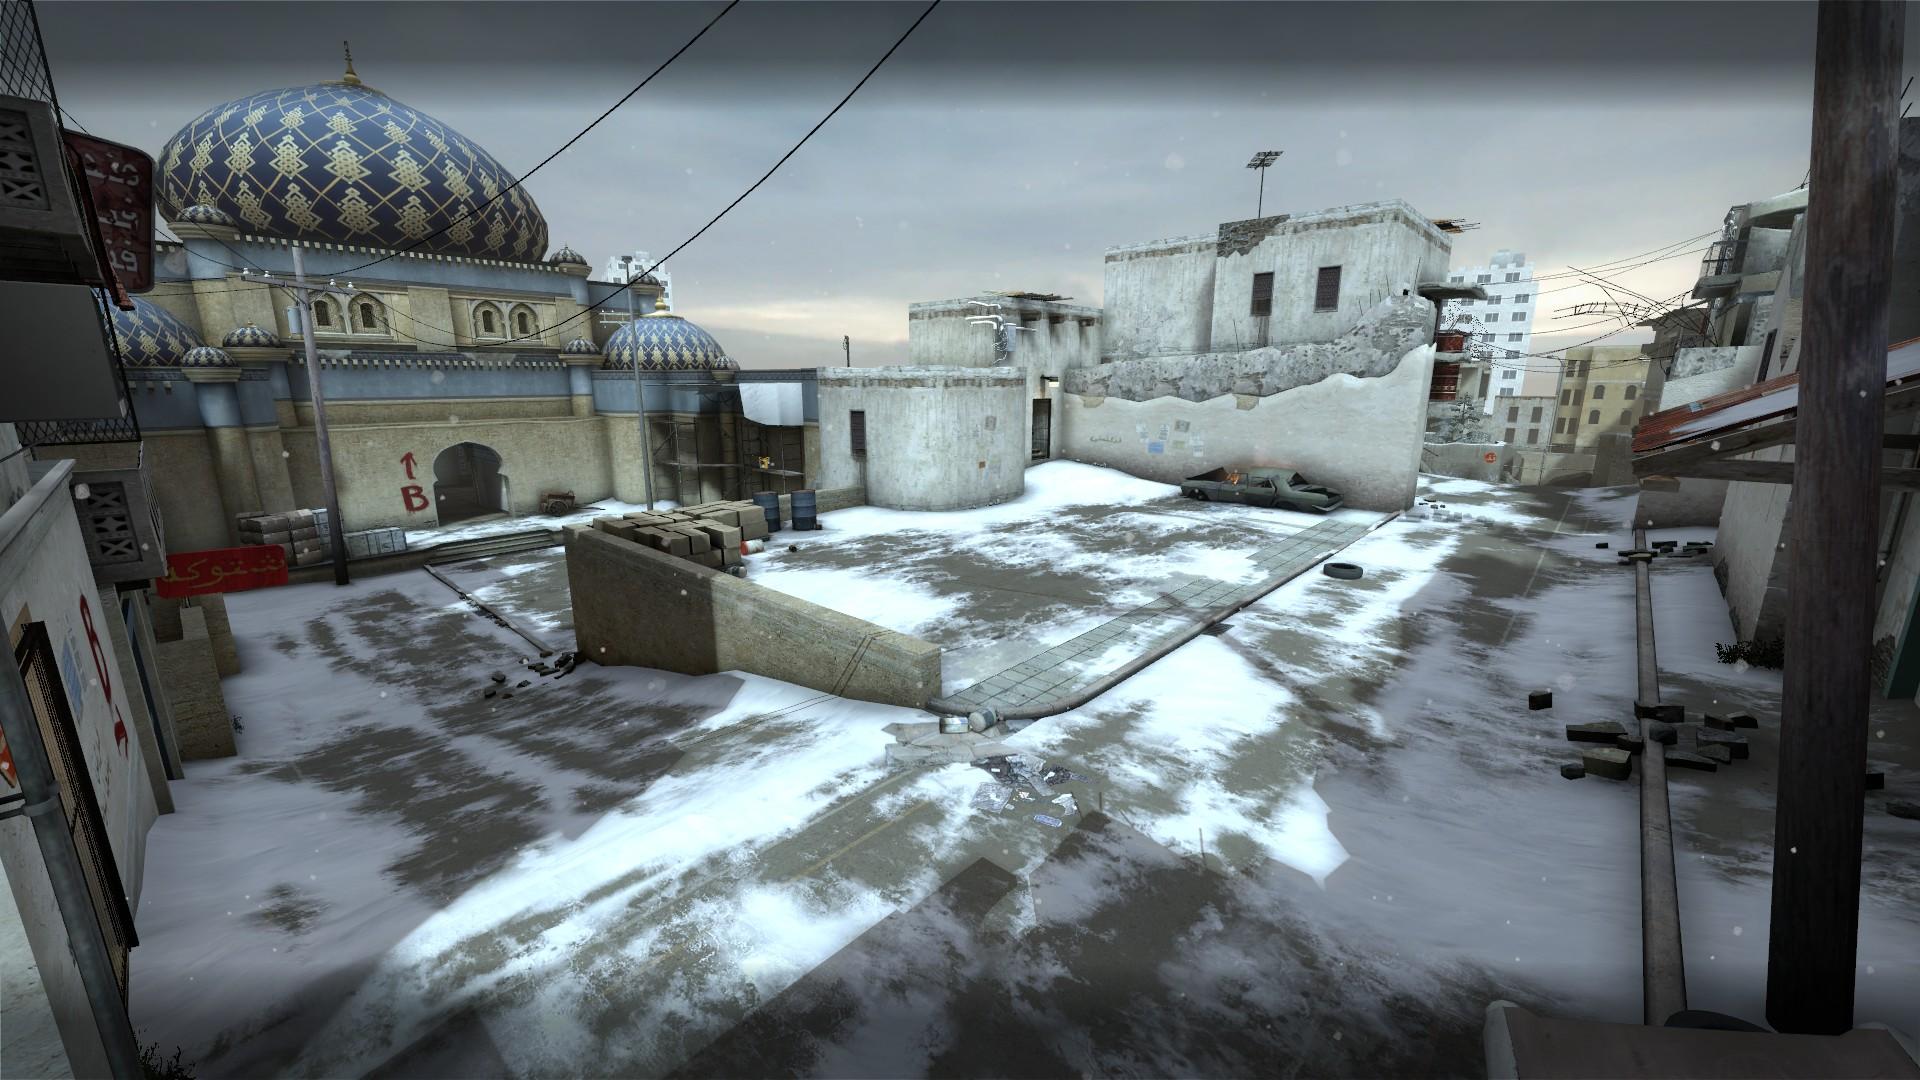 de dust2 winter